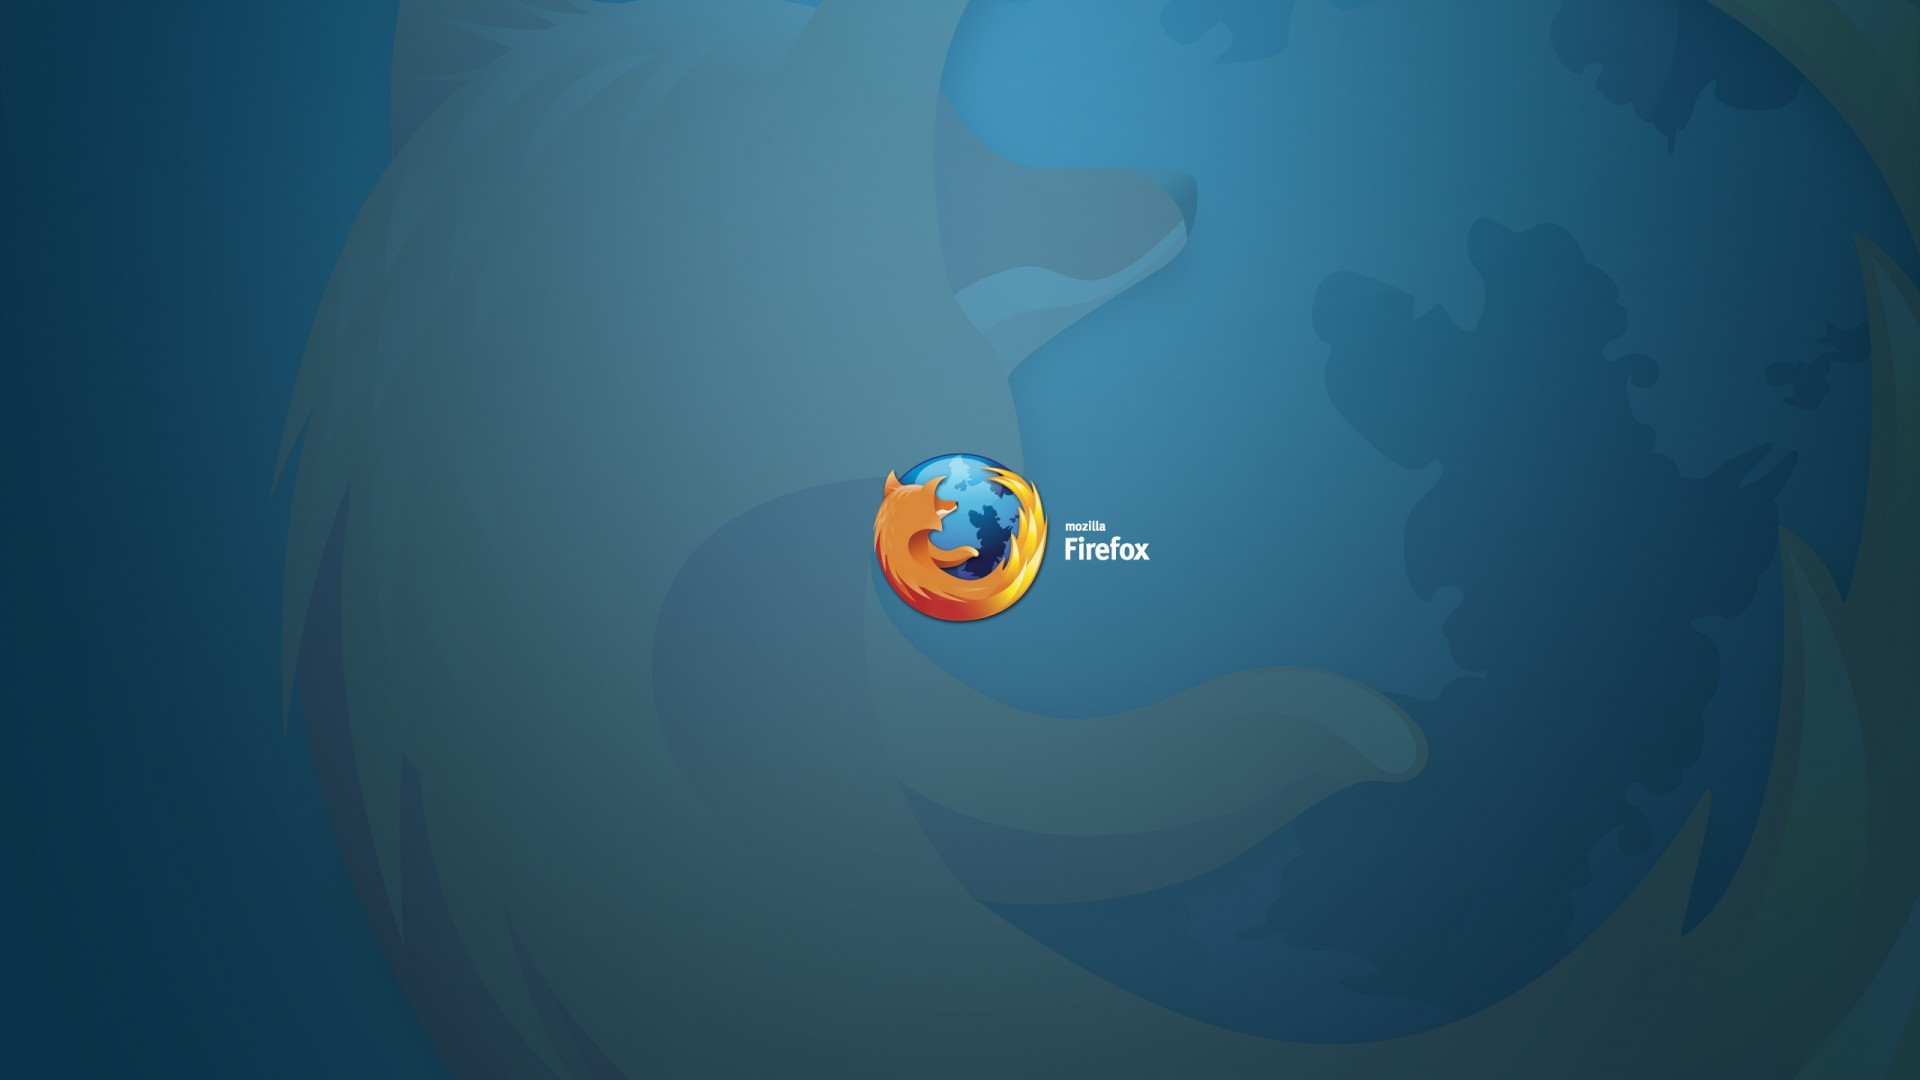 75+] Firefox Wallpapers on WallpaperSafari